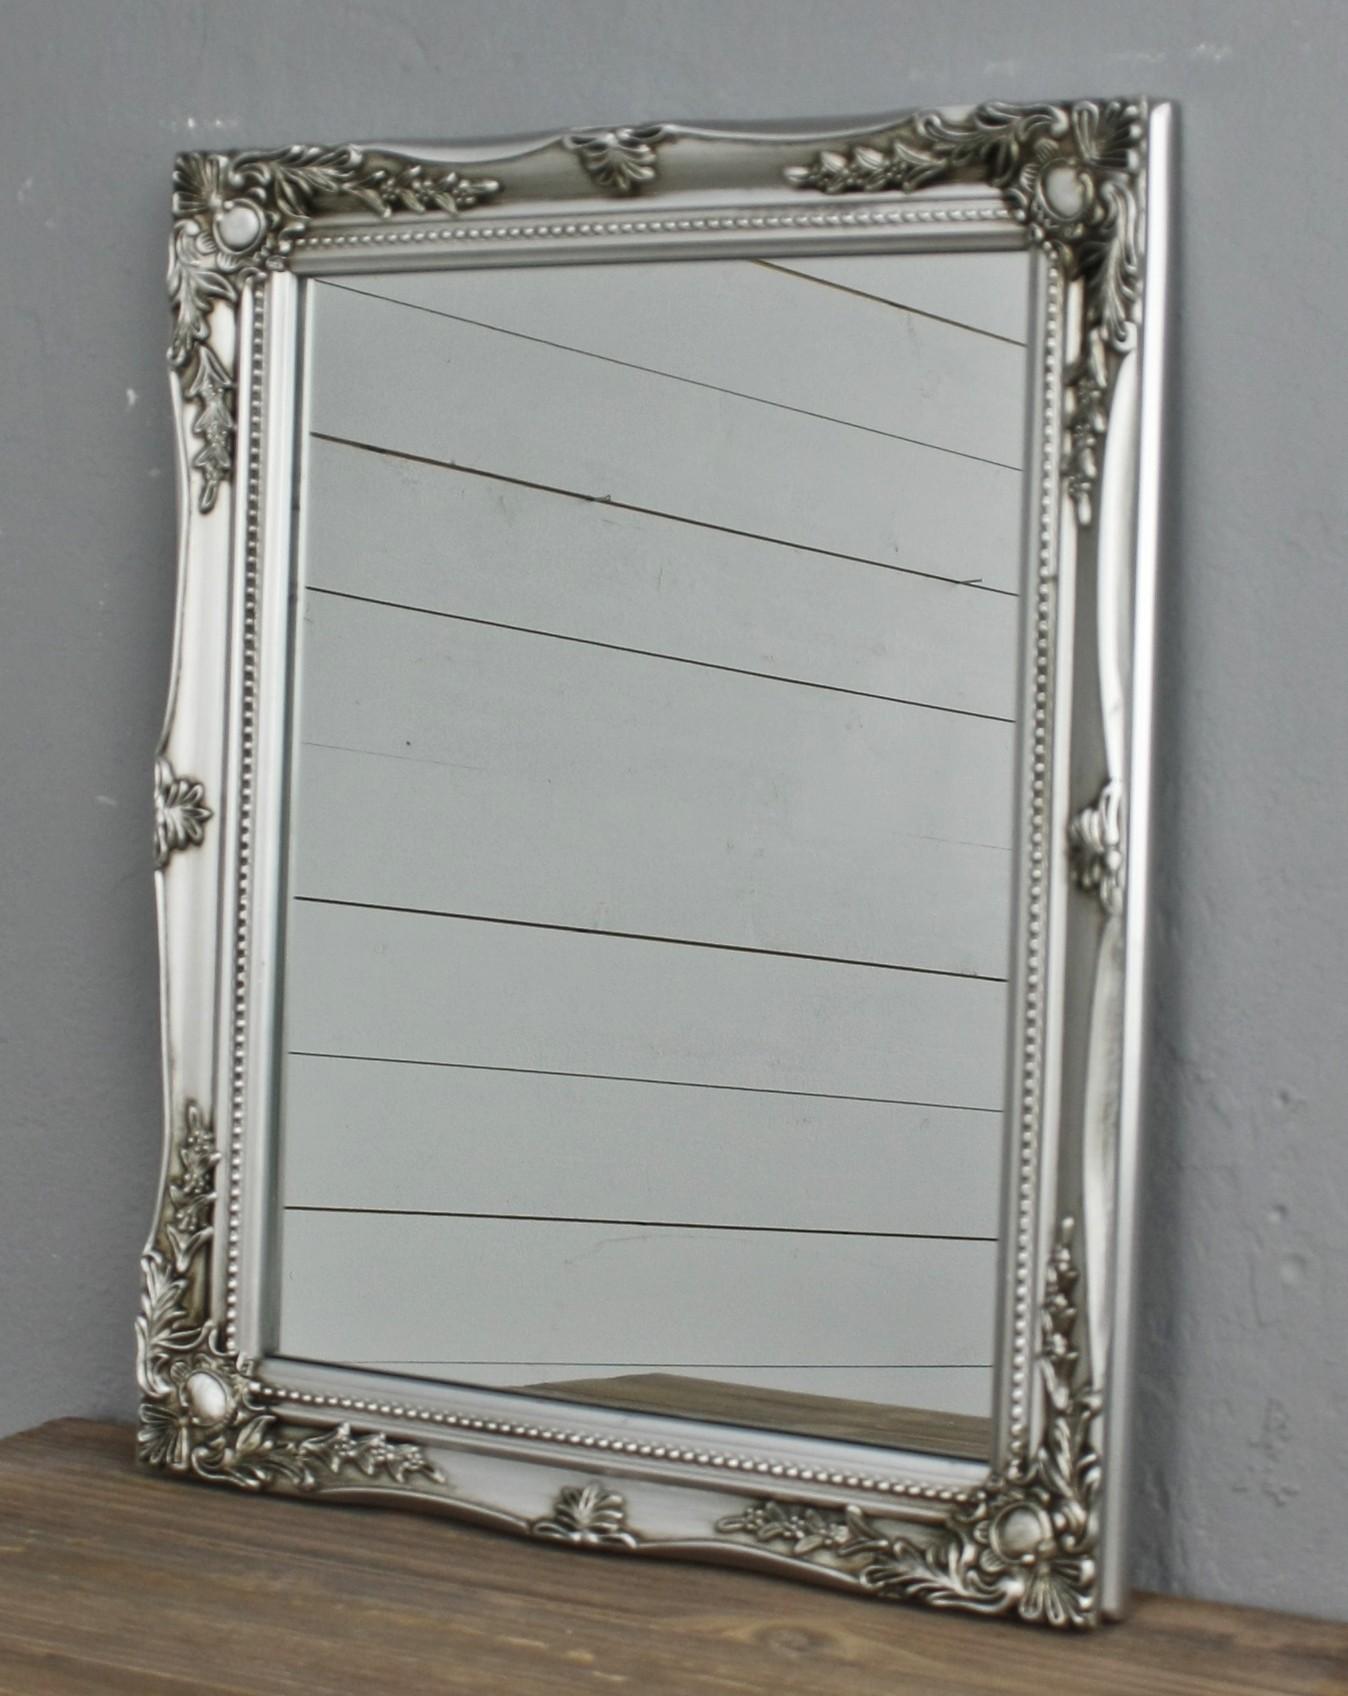 spiegel silber holz barock